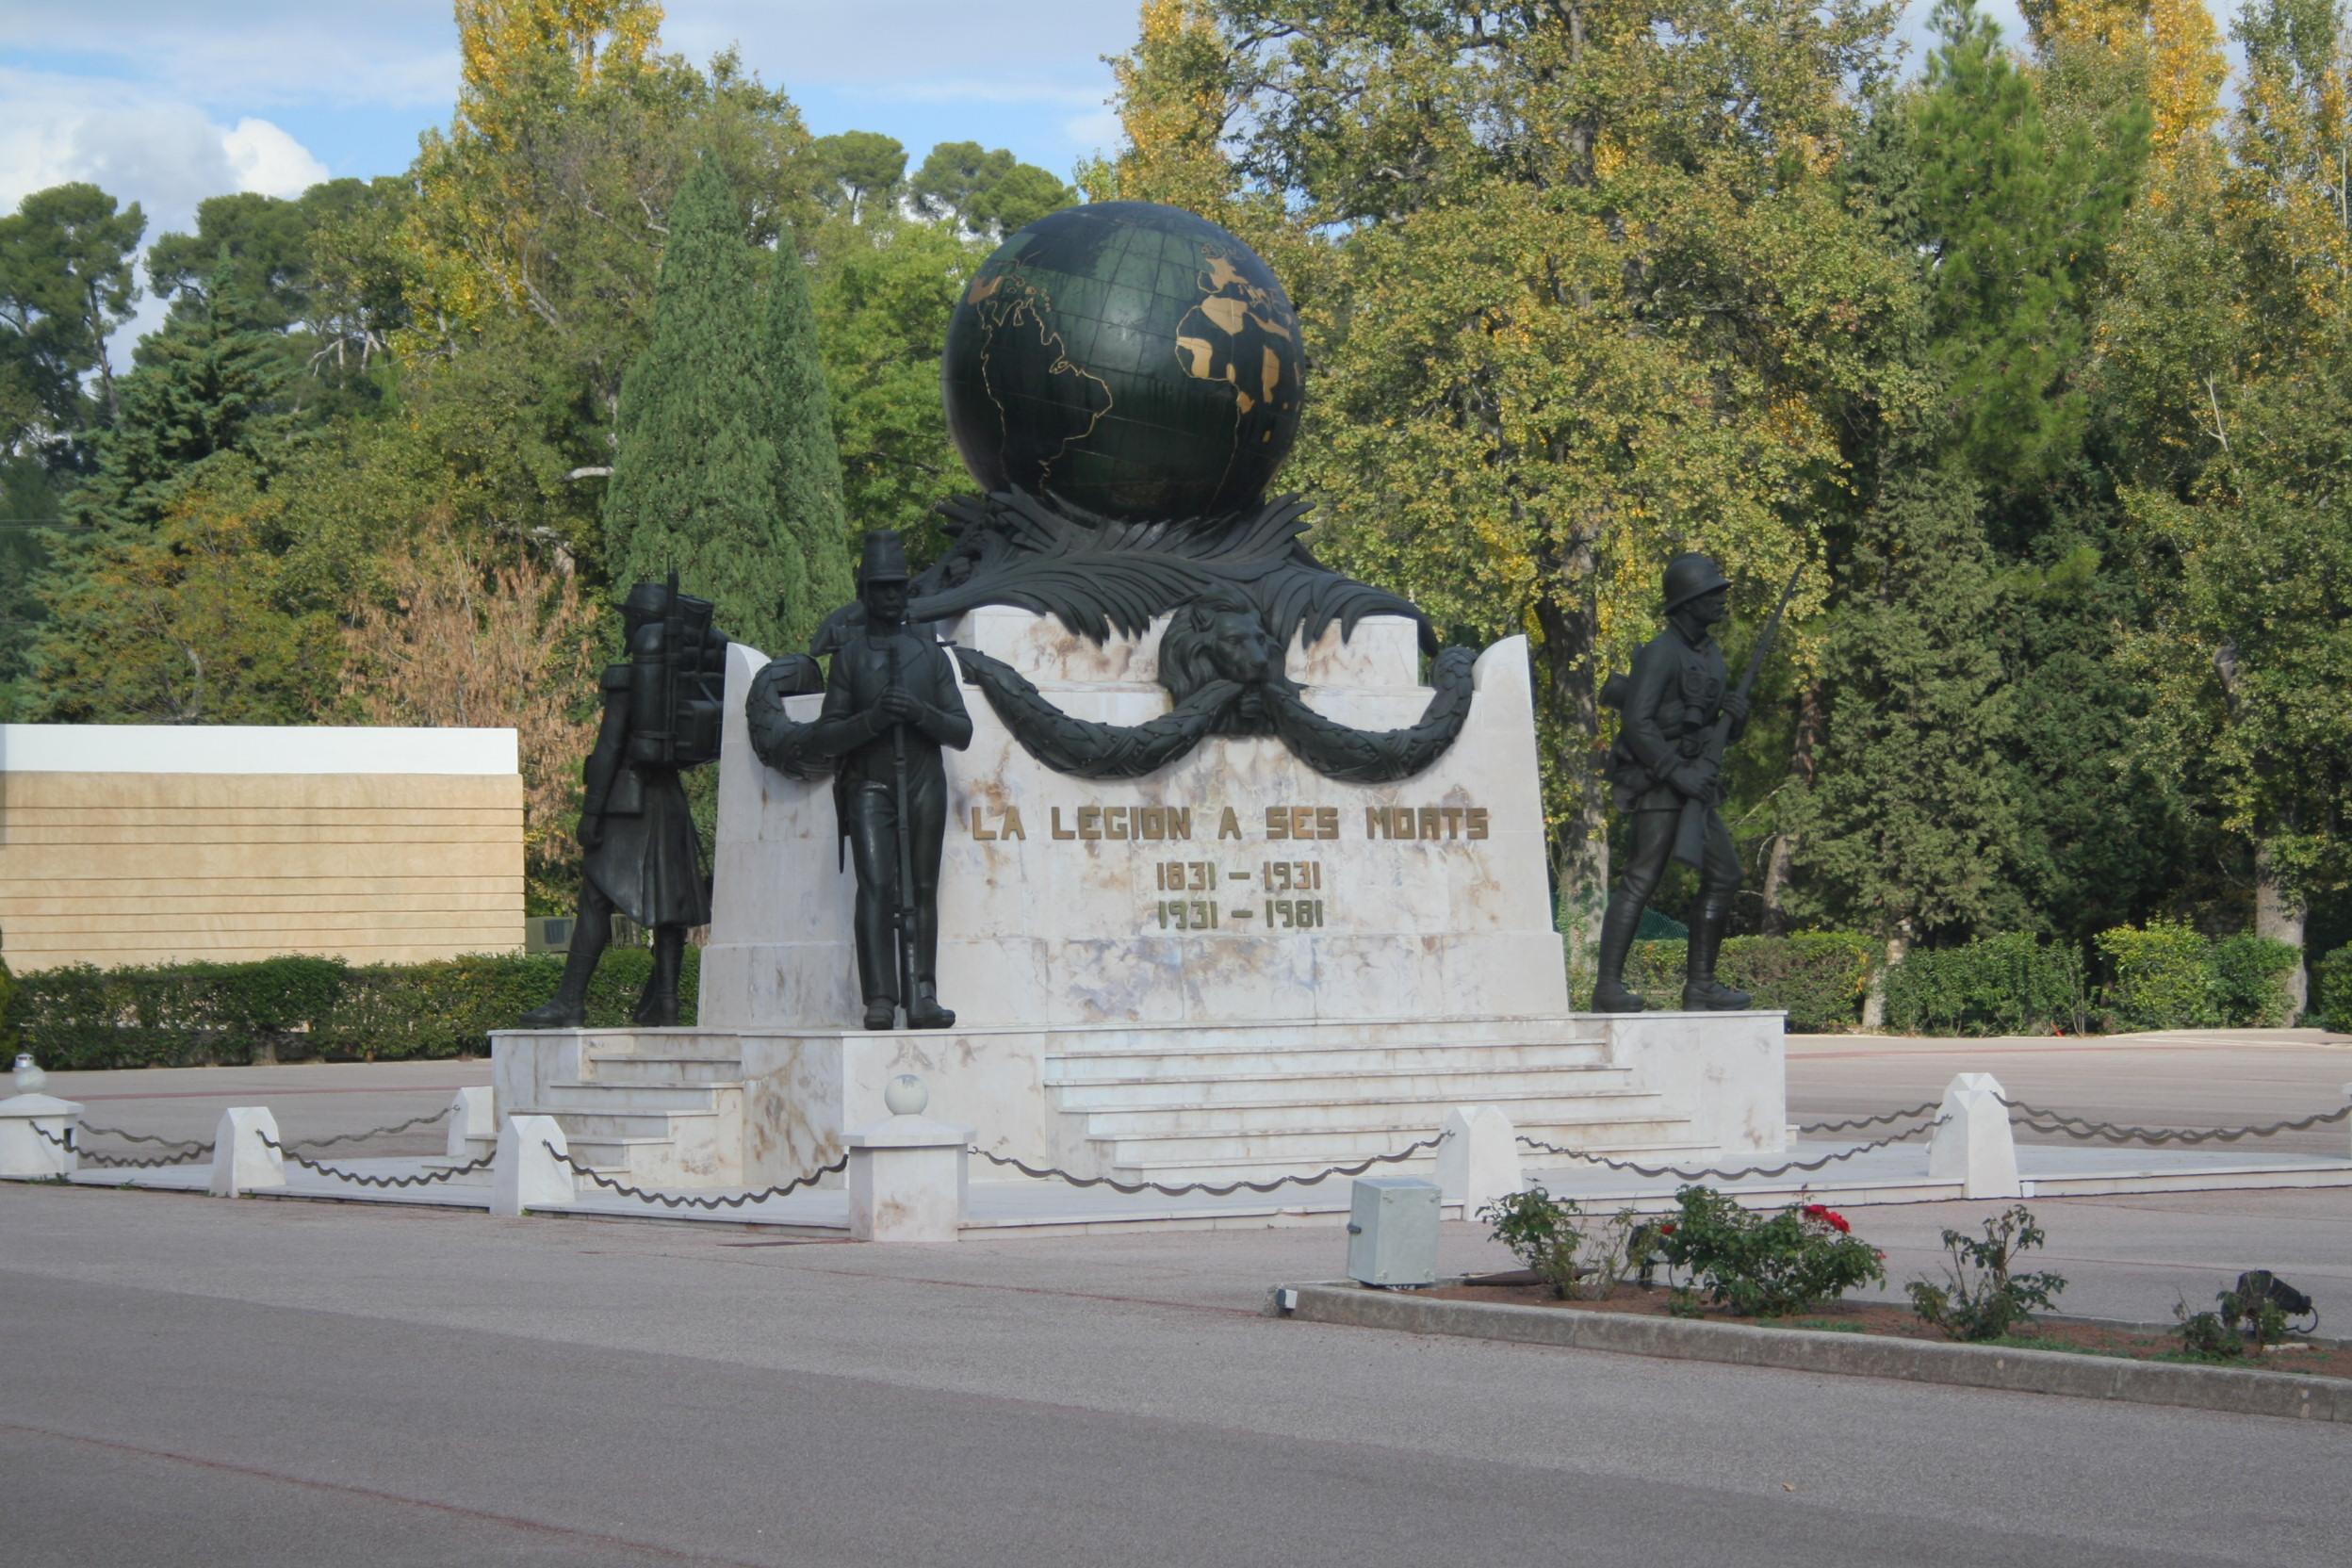 Sidi_Bel_Abbes_Monument_morts_legion